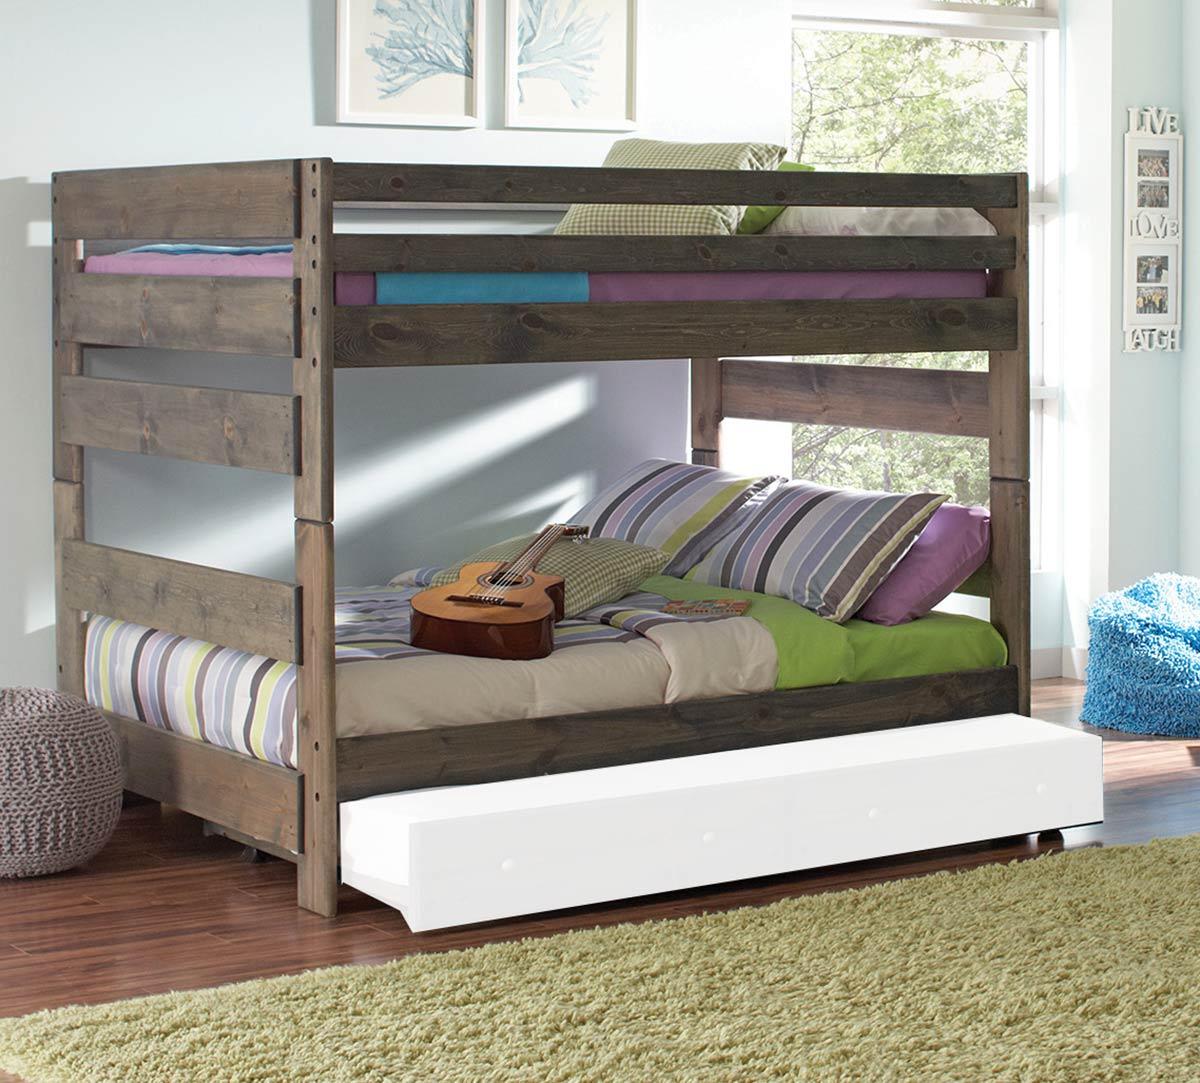 Coaster Wrangle Full/Full Size Storage Bunk Bed - Gunsmoke